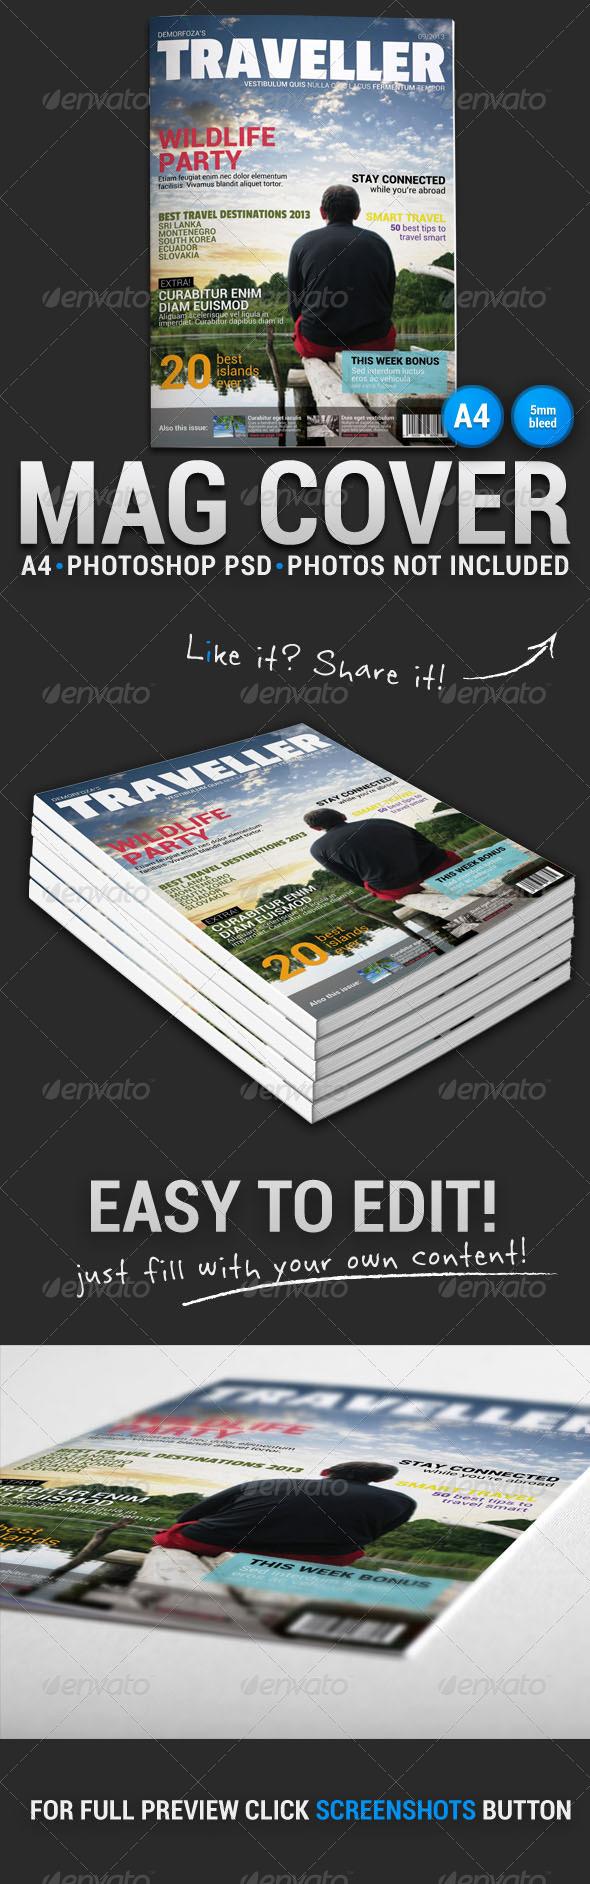 Magazine Cover 1 - Magazines Print Templates